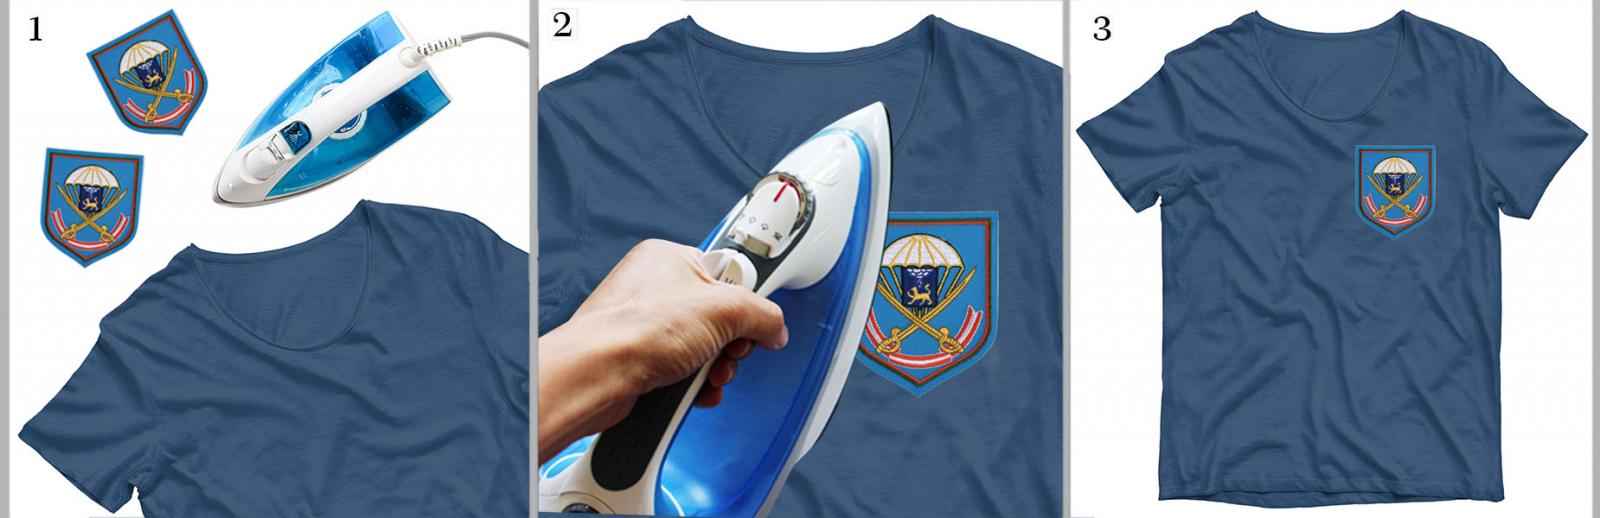 Эмблема-нашивка ВДВ 104 ПДП на футболке